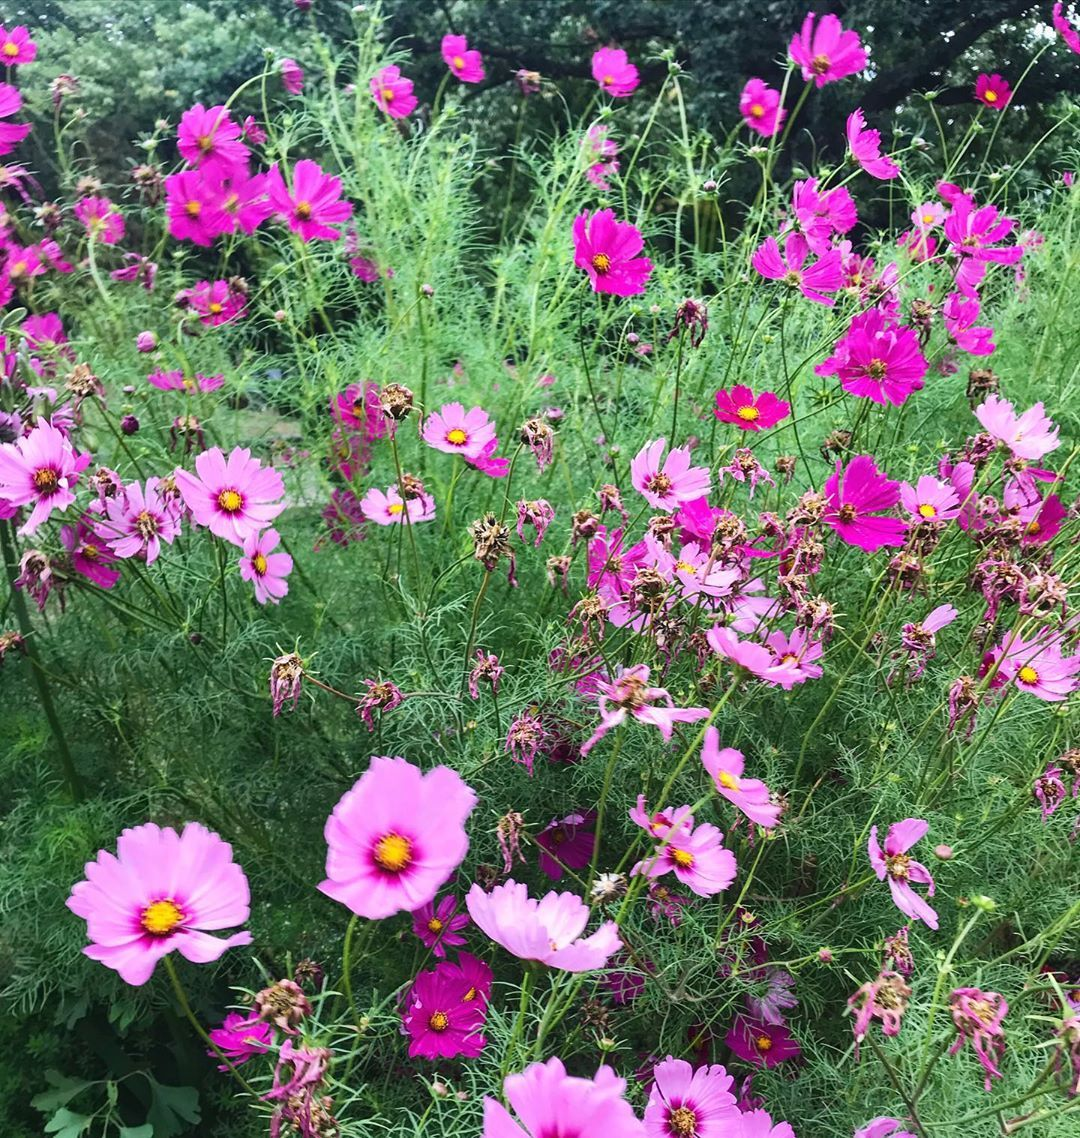 Cosmos Amazing Flowers Flowerphotography Garden Garten Gardeninspiration Gard In 2020 Flowers Photography Garden Inspiration Big Flowers